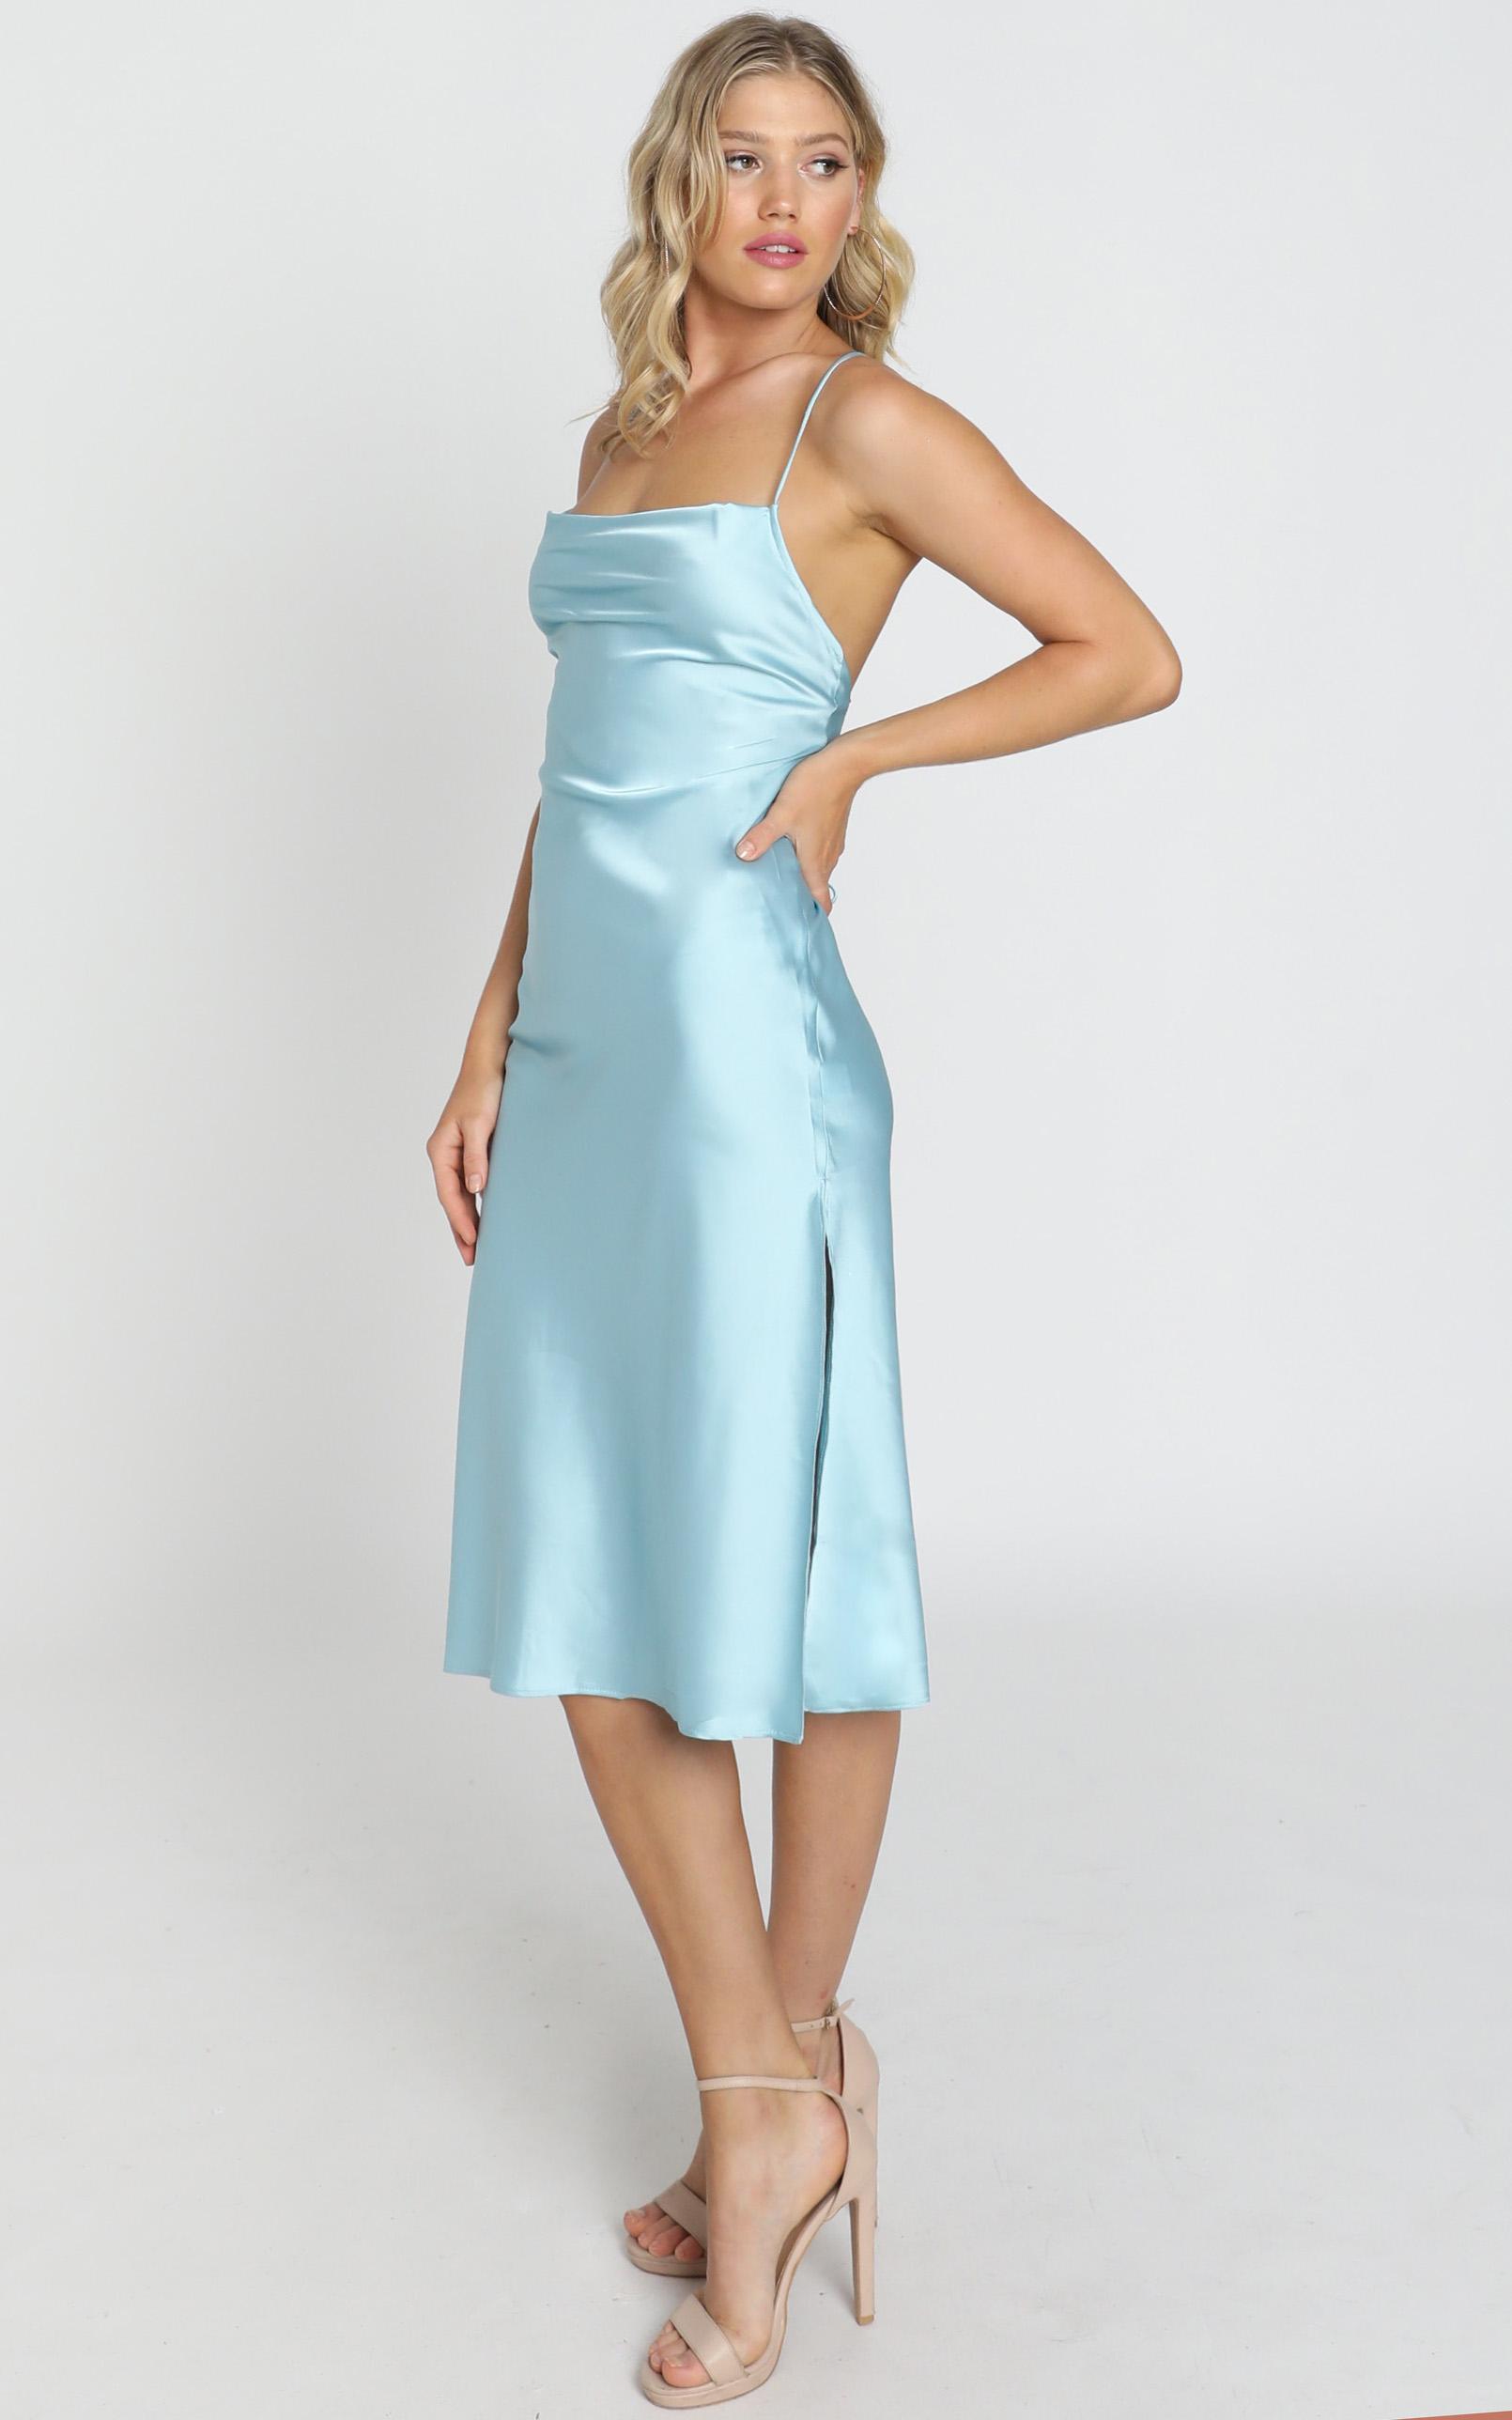 Tiggy Dress in sky satin - 12 (L), Blue, hi-res image number null